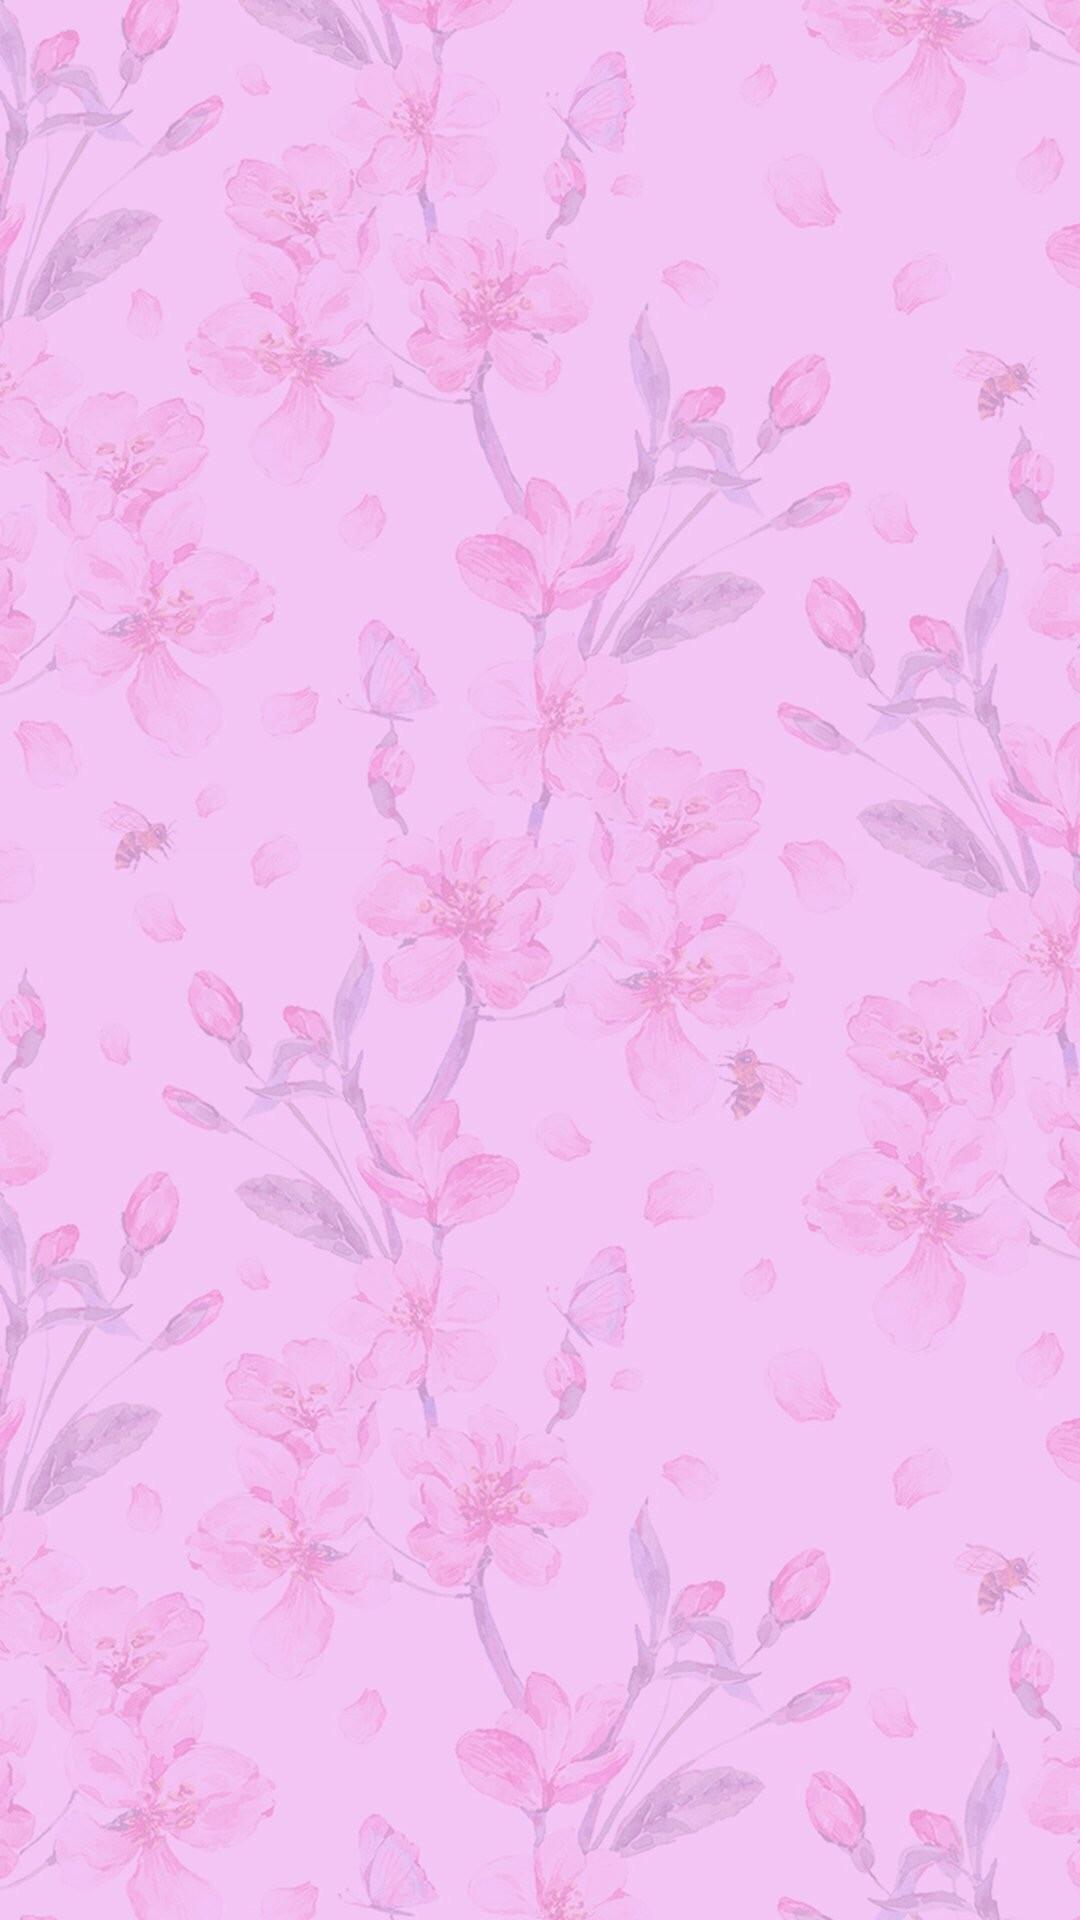 pink paisley wallpaper 35 images